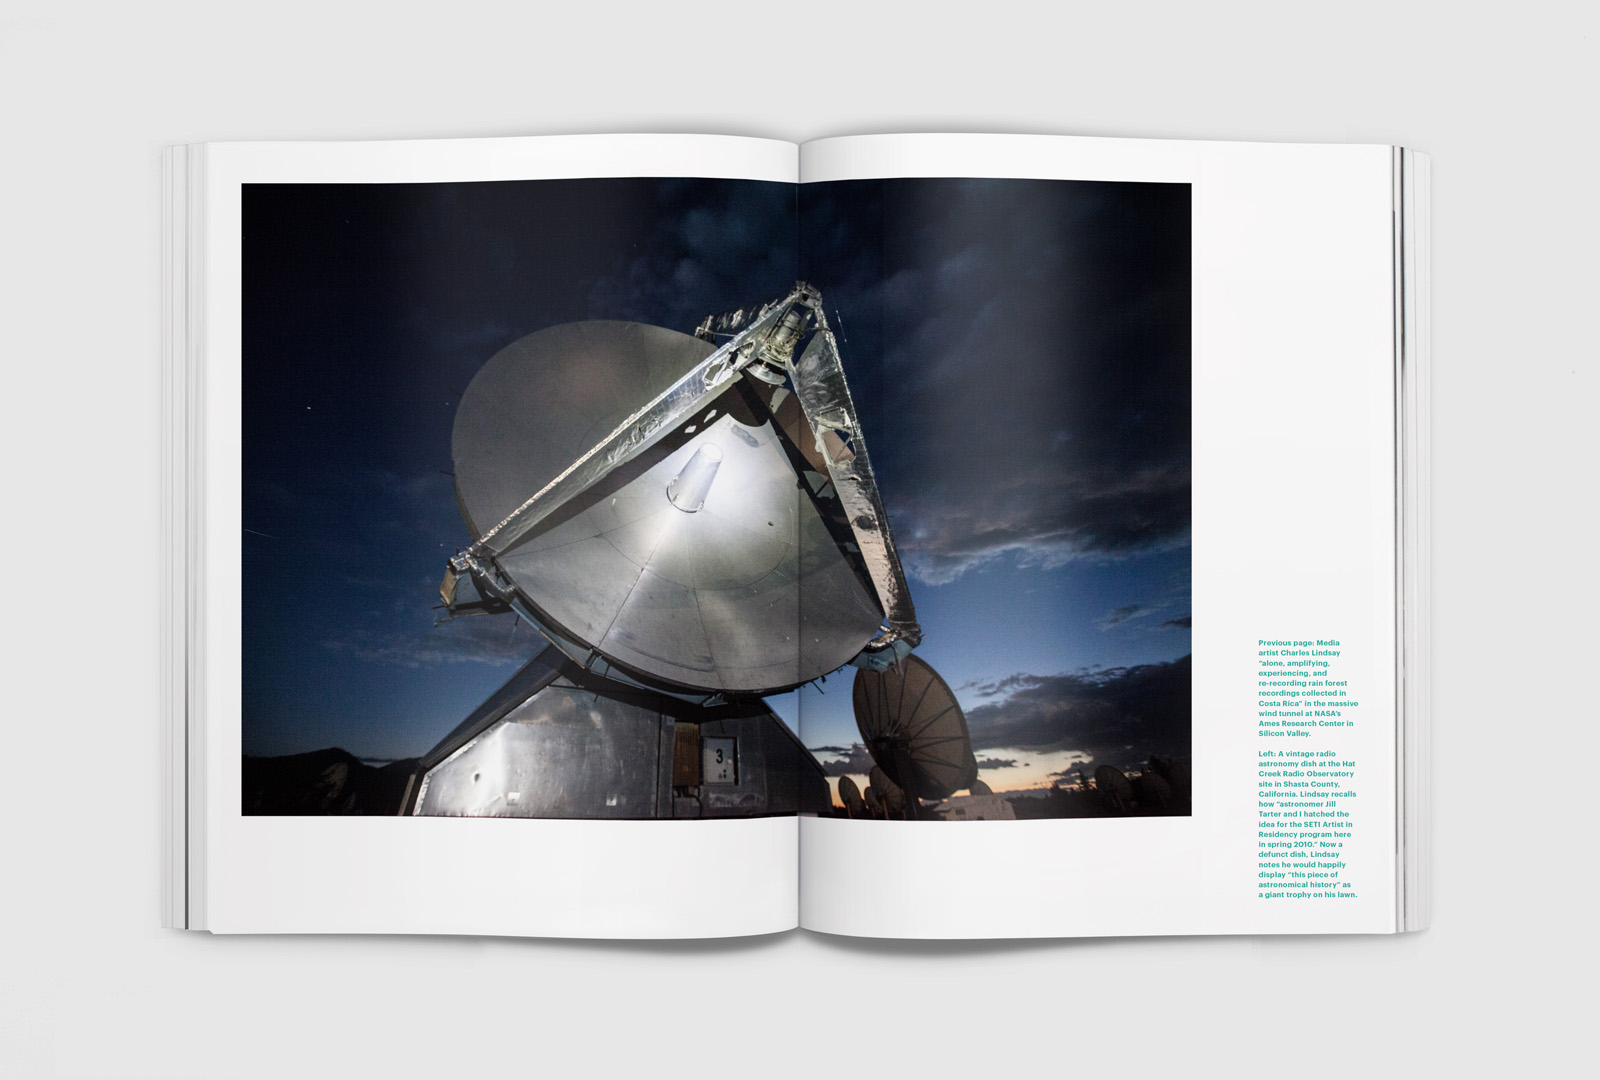 H2_TOUR_GRID_SETI